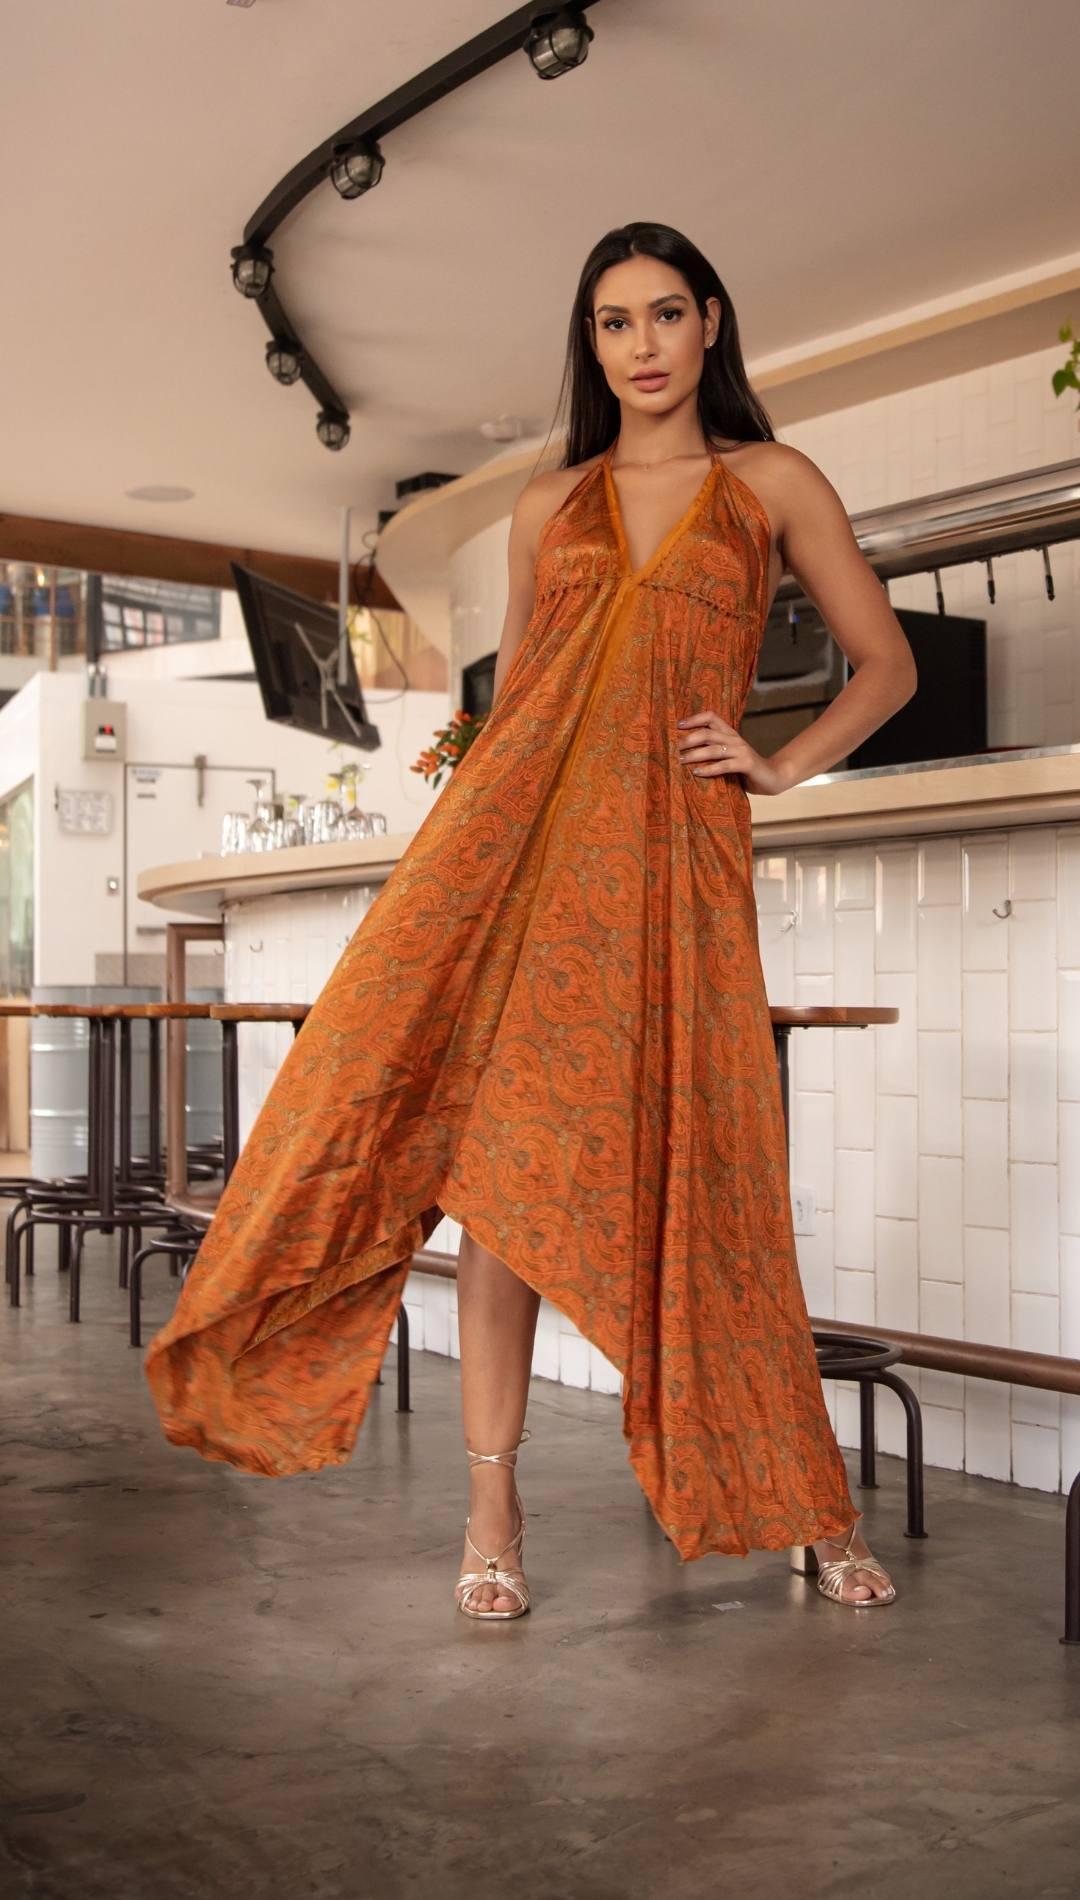 Vestido Midi Boho Indie Abertura Estampado Laranja  Indiano